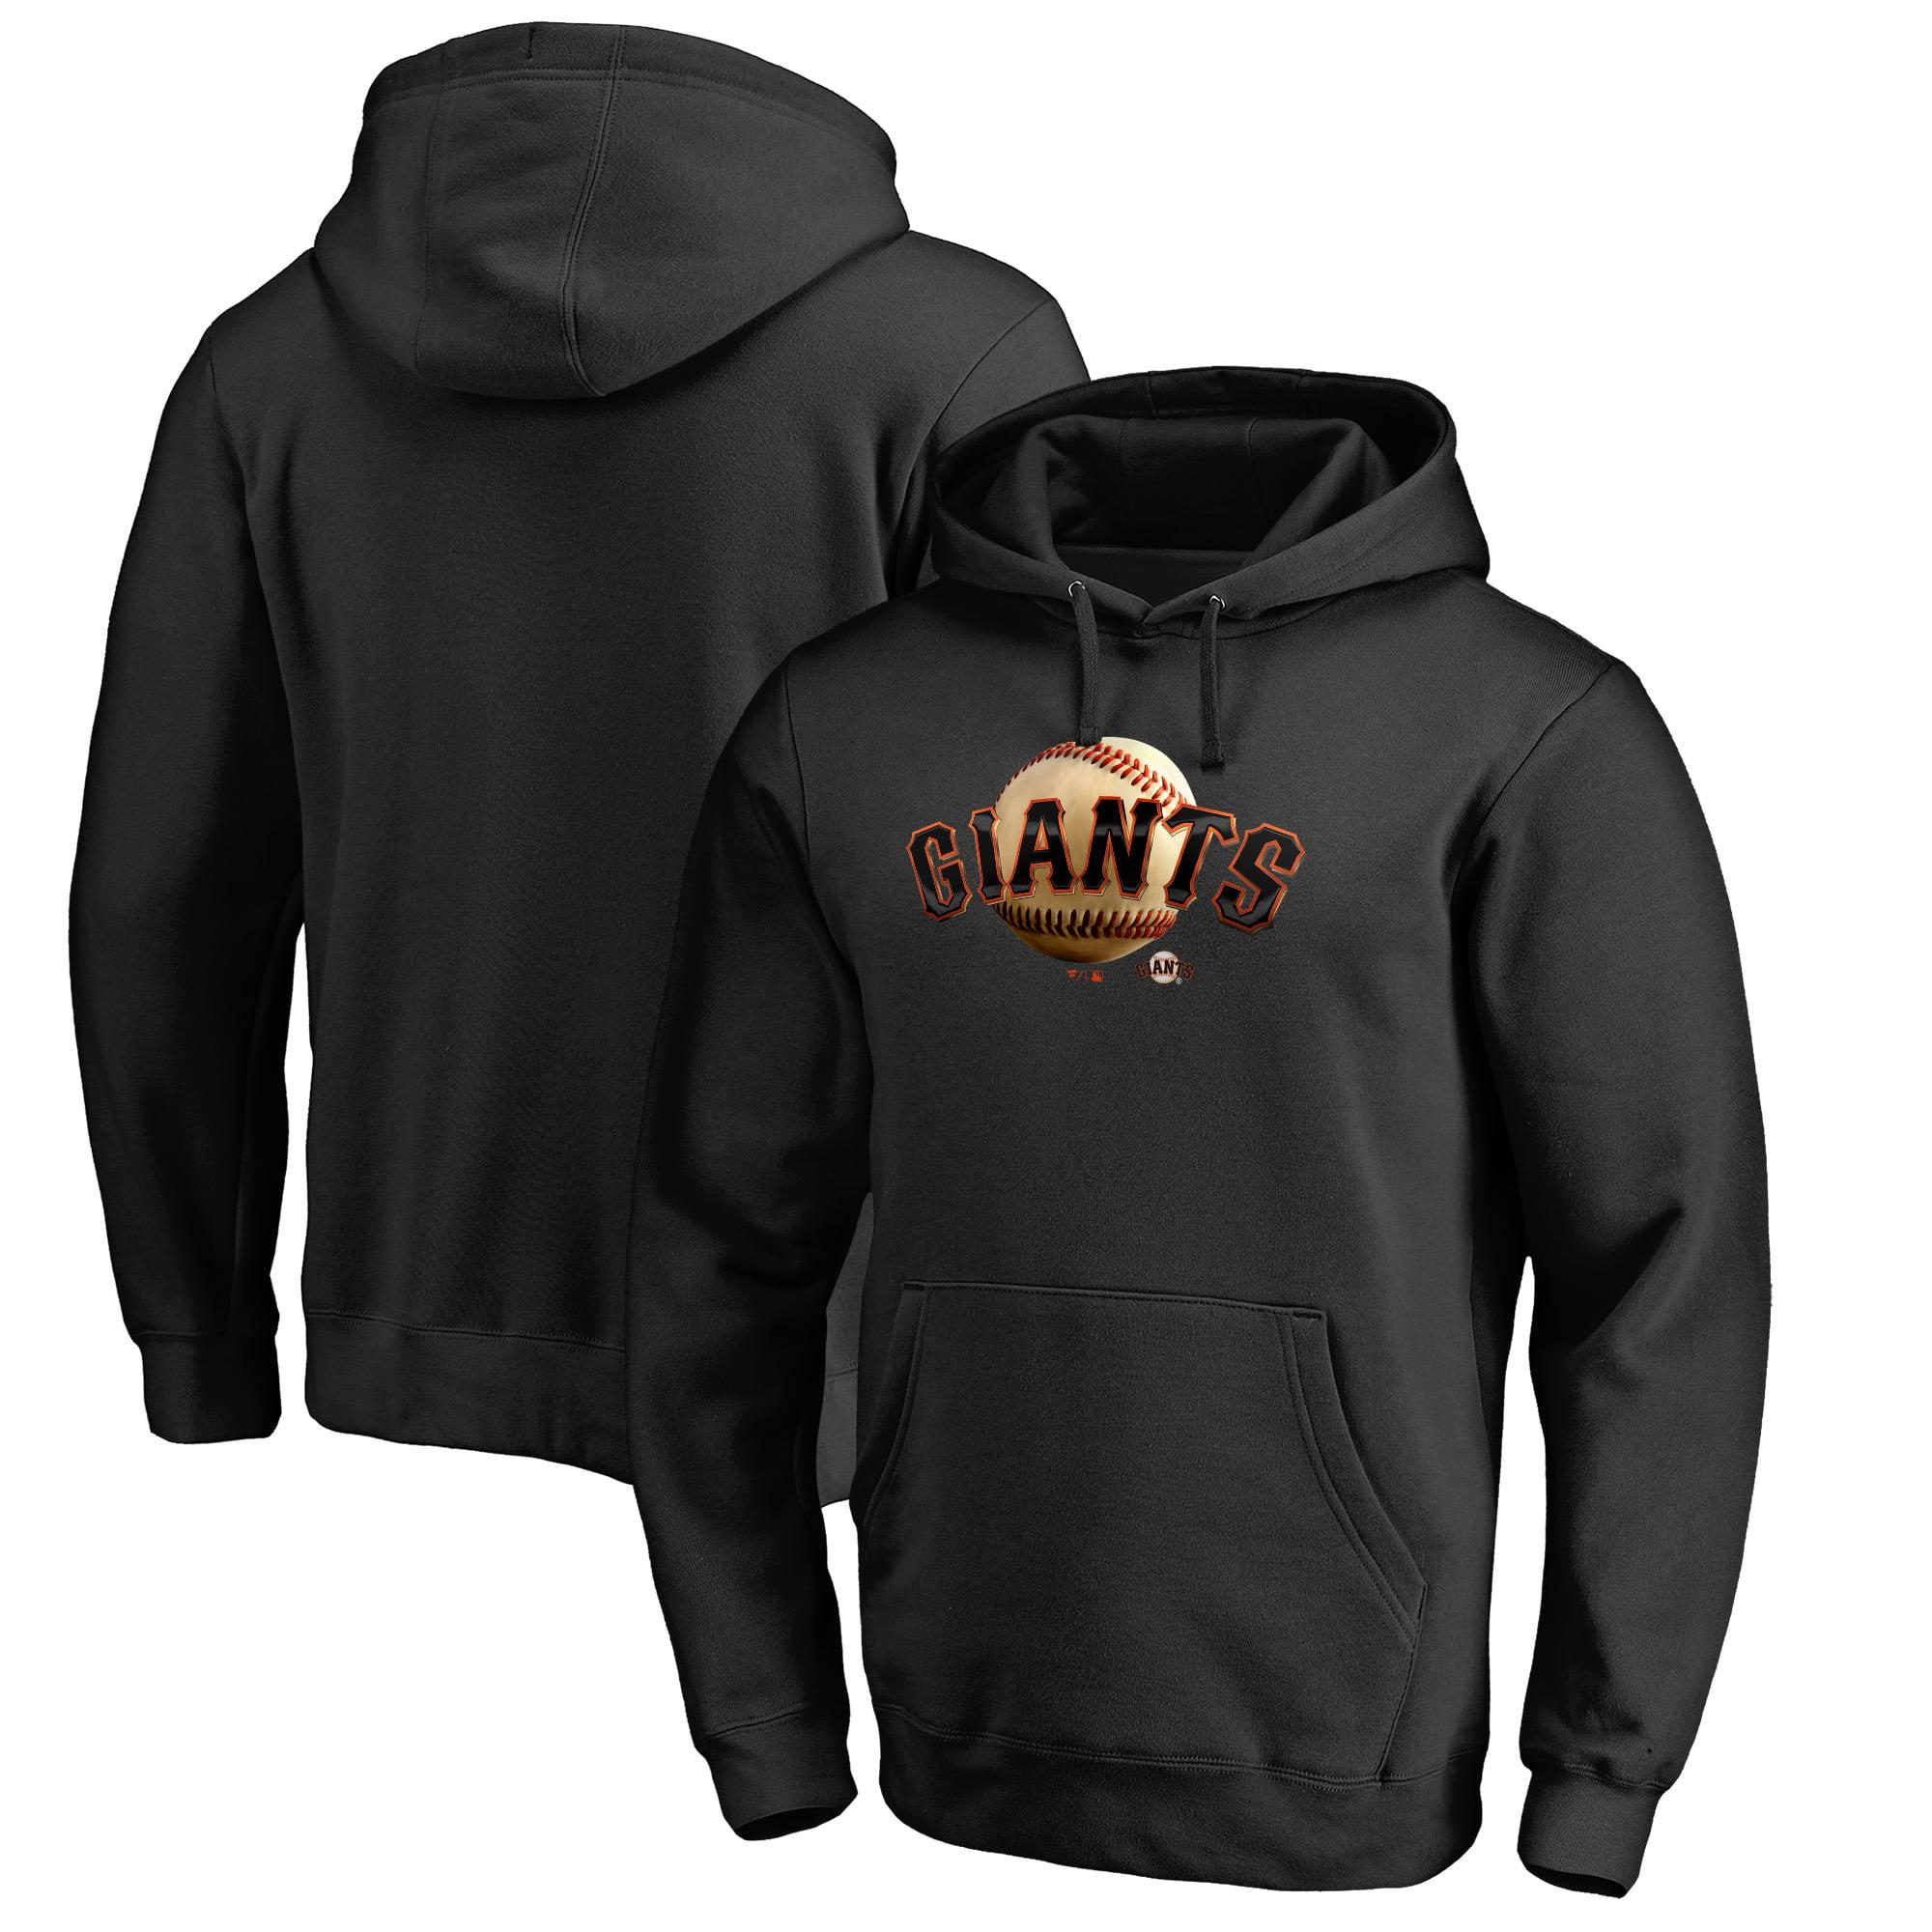 San Francisco Giants Fanatics Branded Midnight Mascot Pullover Hoodie - Black